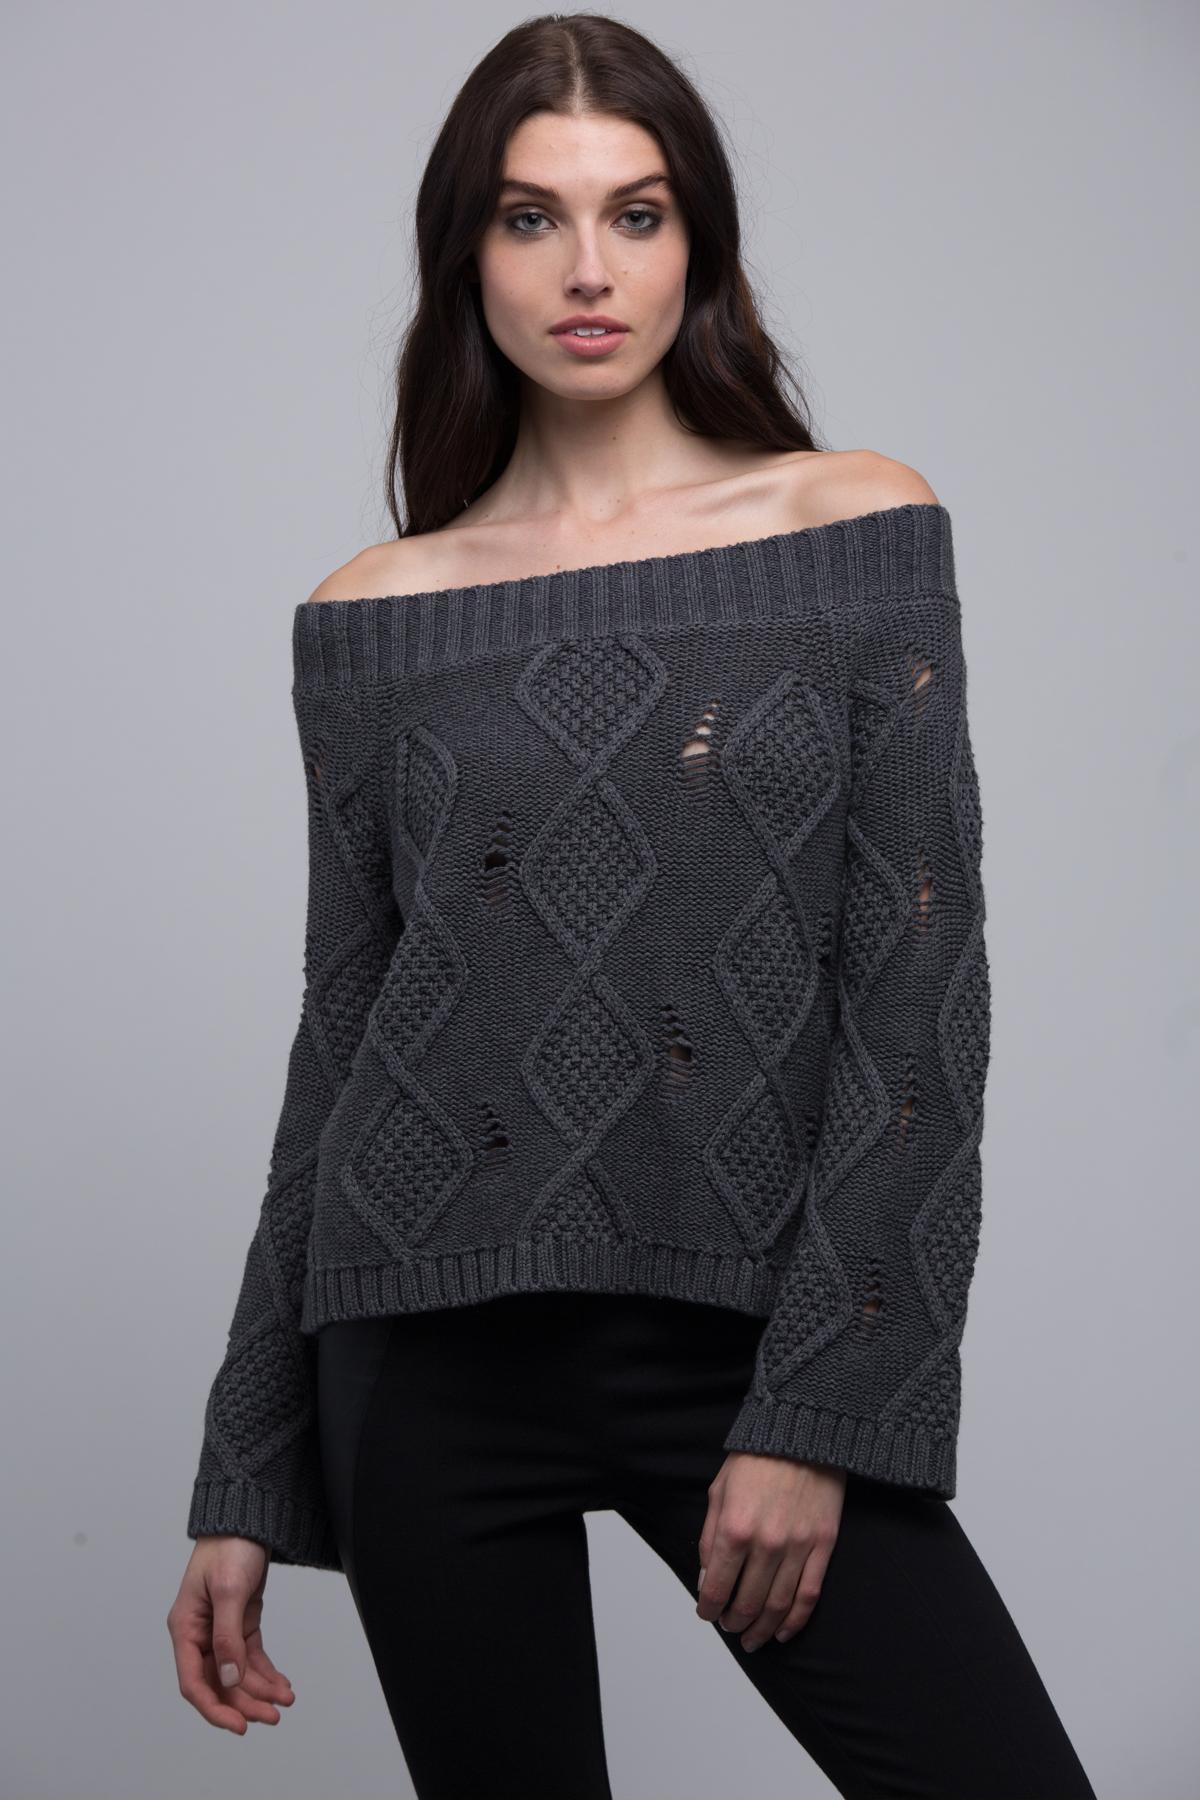 https://www.purplepoppy.com/product/525-america-sweater/